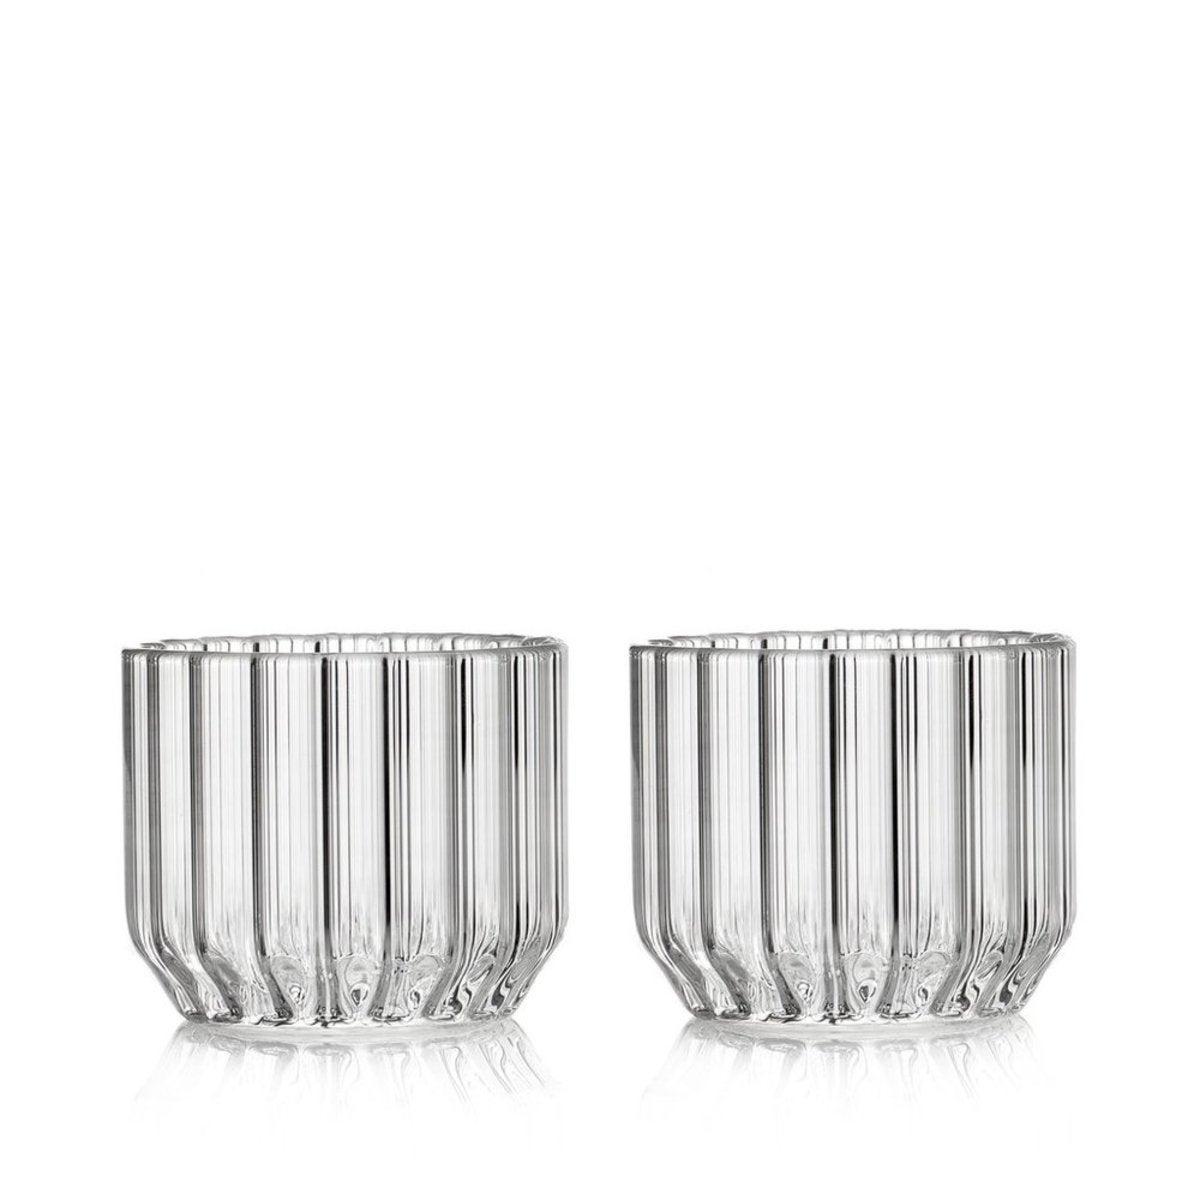 Dearborn-wine-glass-set-20181126182119